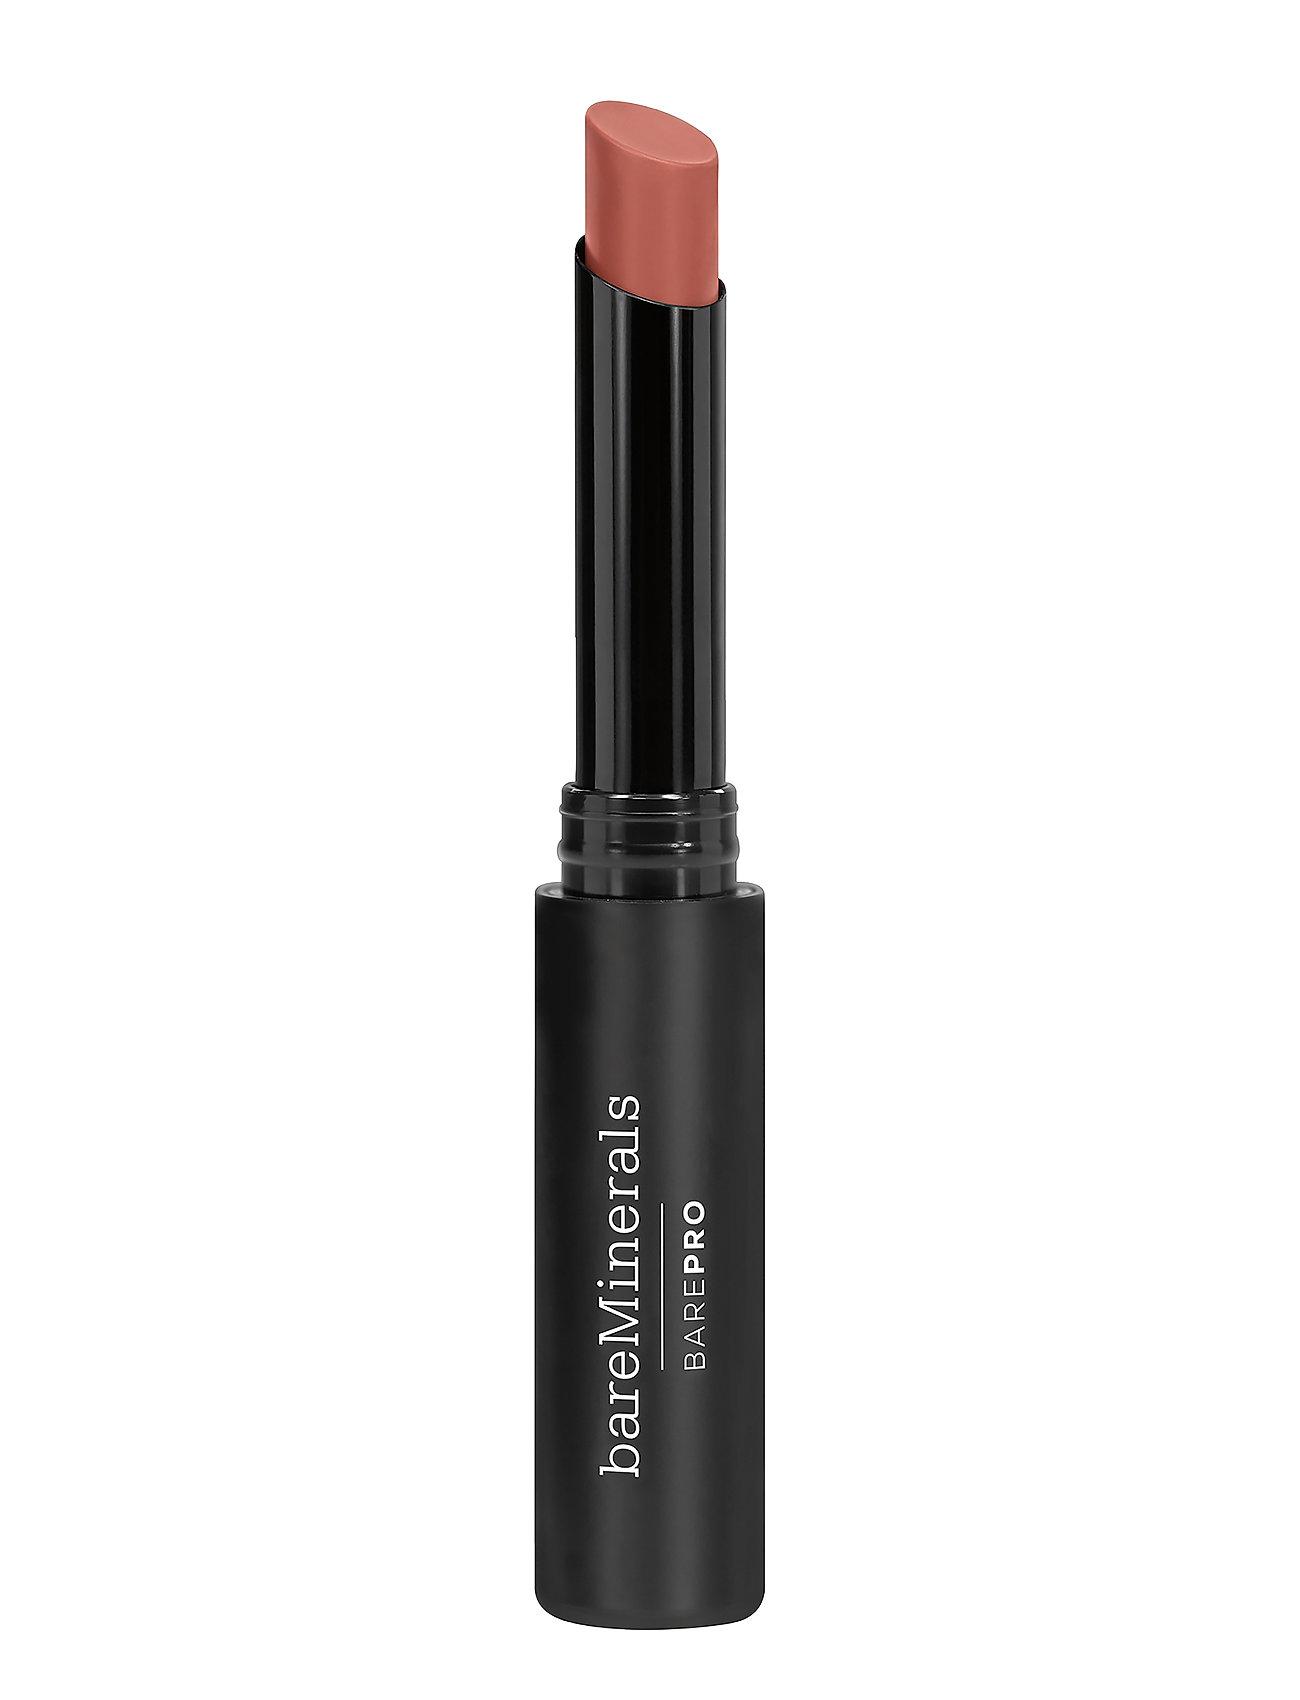 Image of Barepro Longwear Lipstick Spice Læbestift Makeup Brun BareMinerals (3138616953)